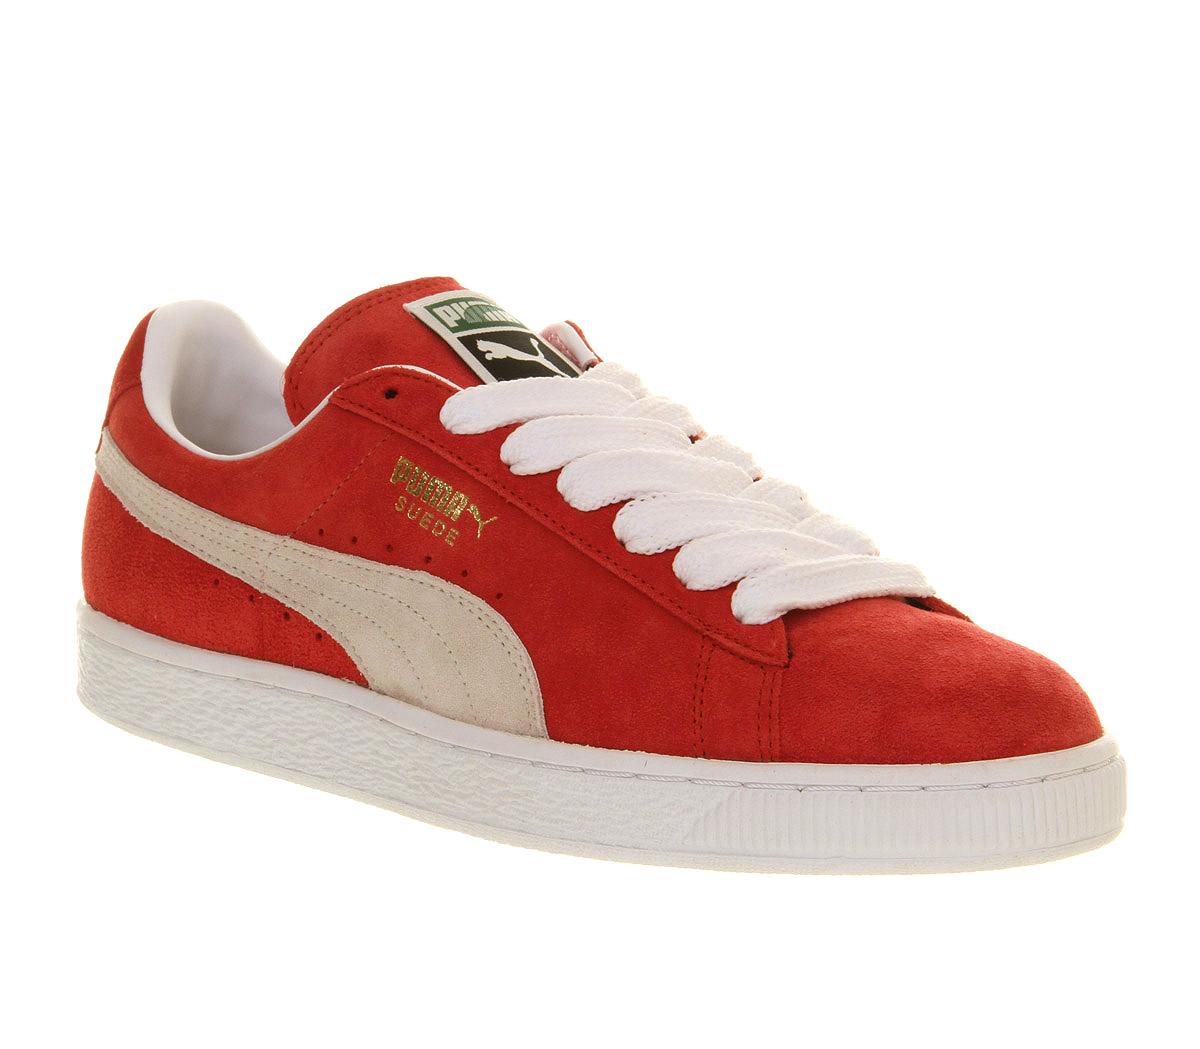 Puma Red Suede